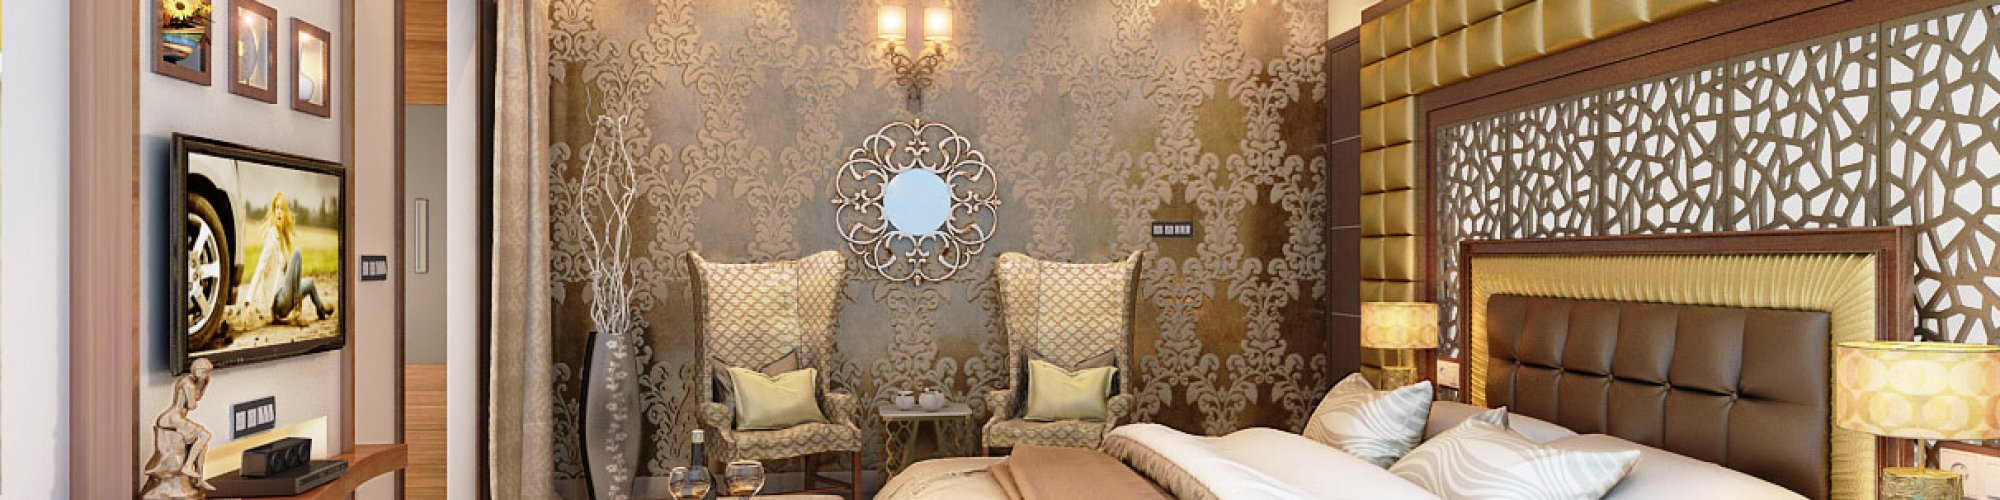 KATAAK   Home Decor In India  Interior Design Online Services